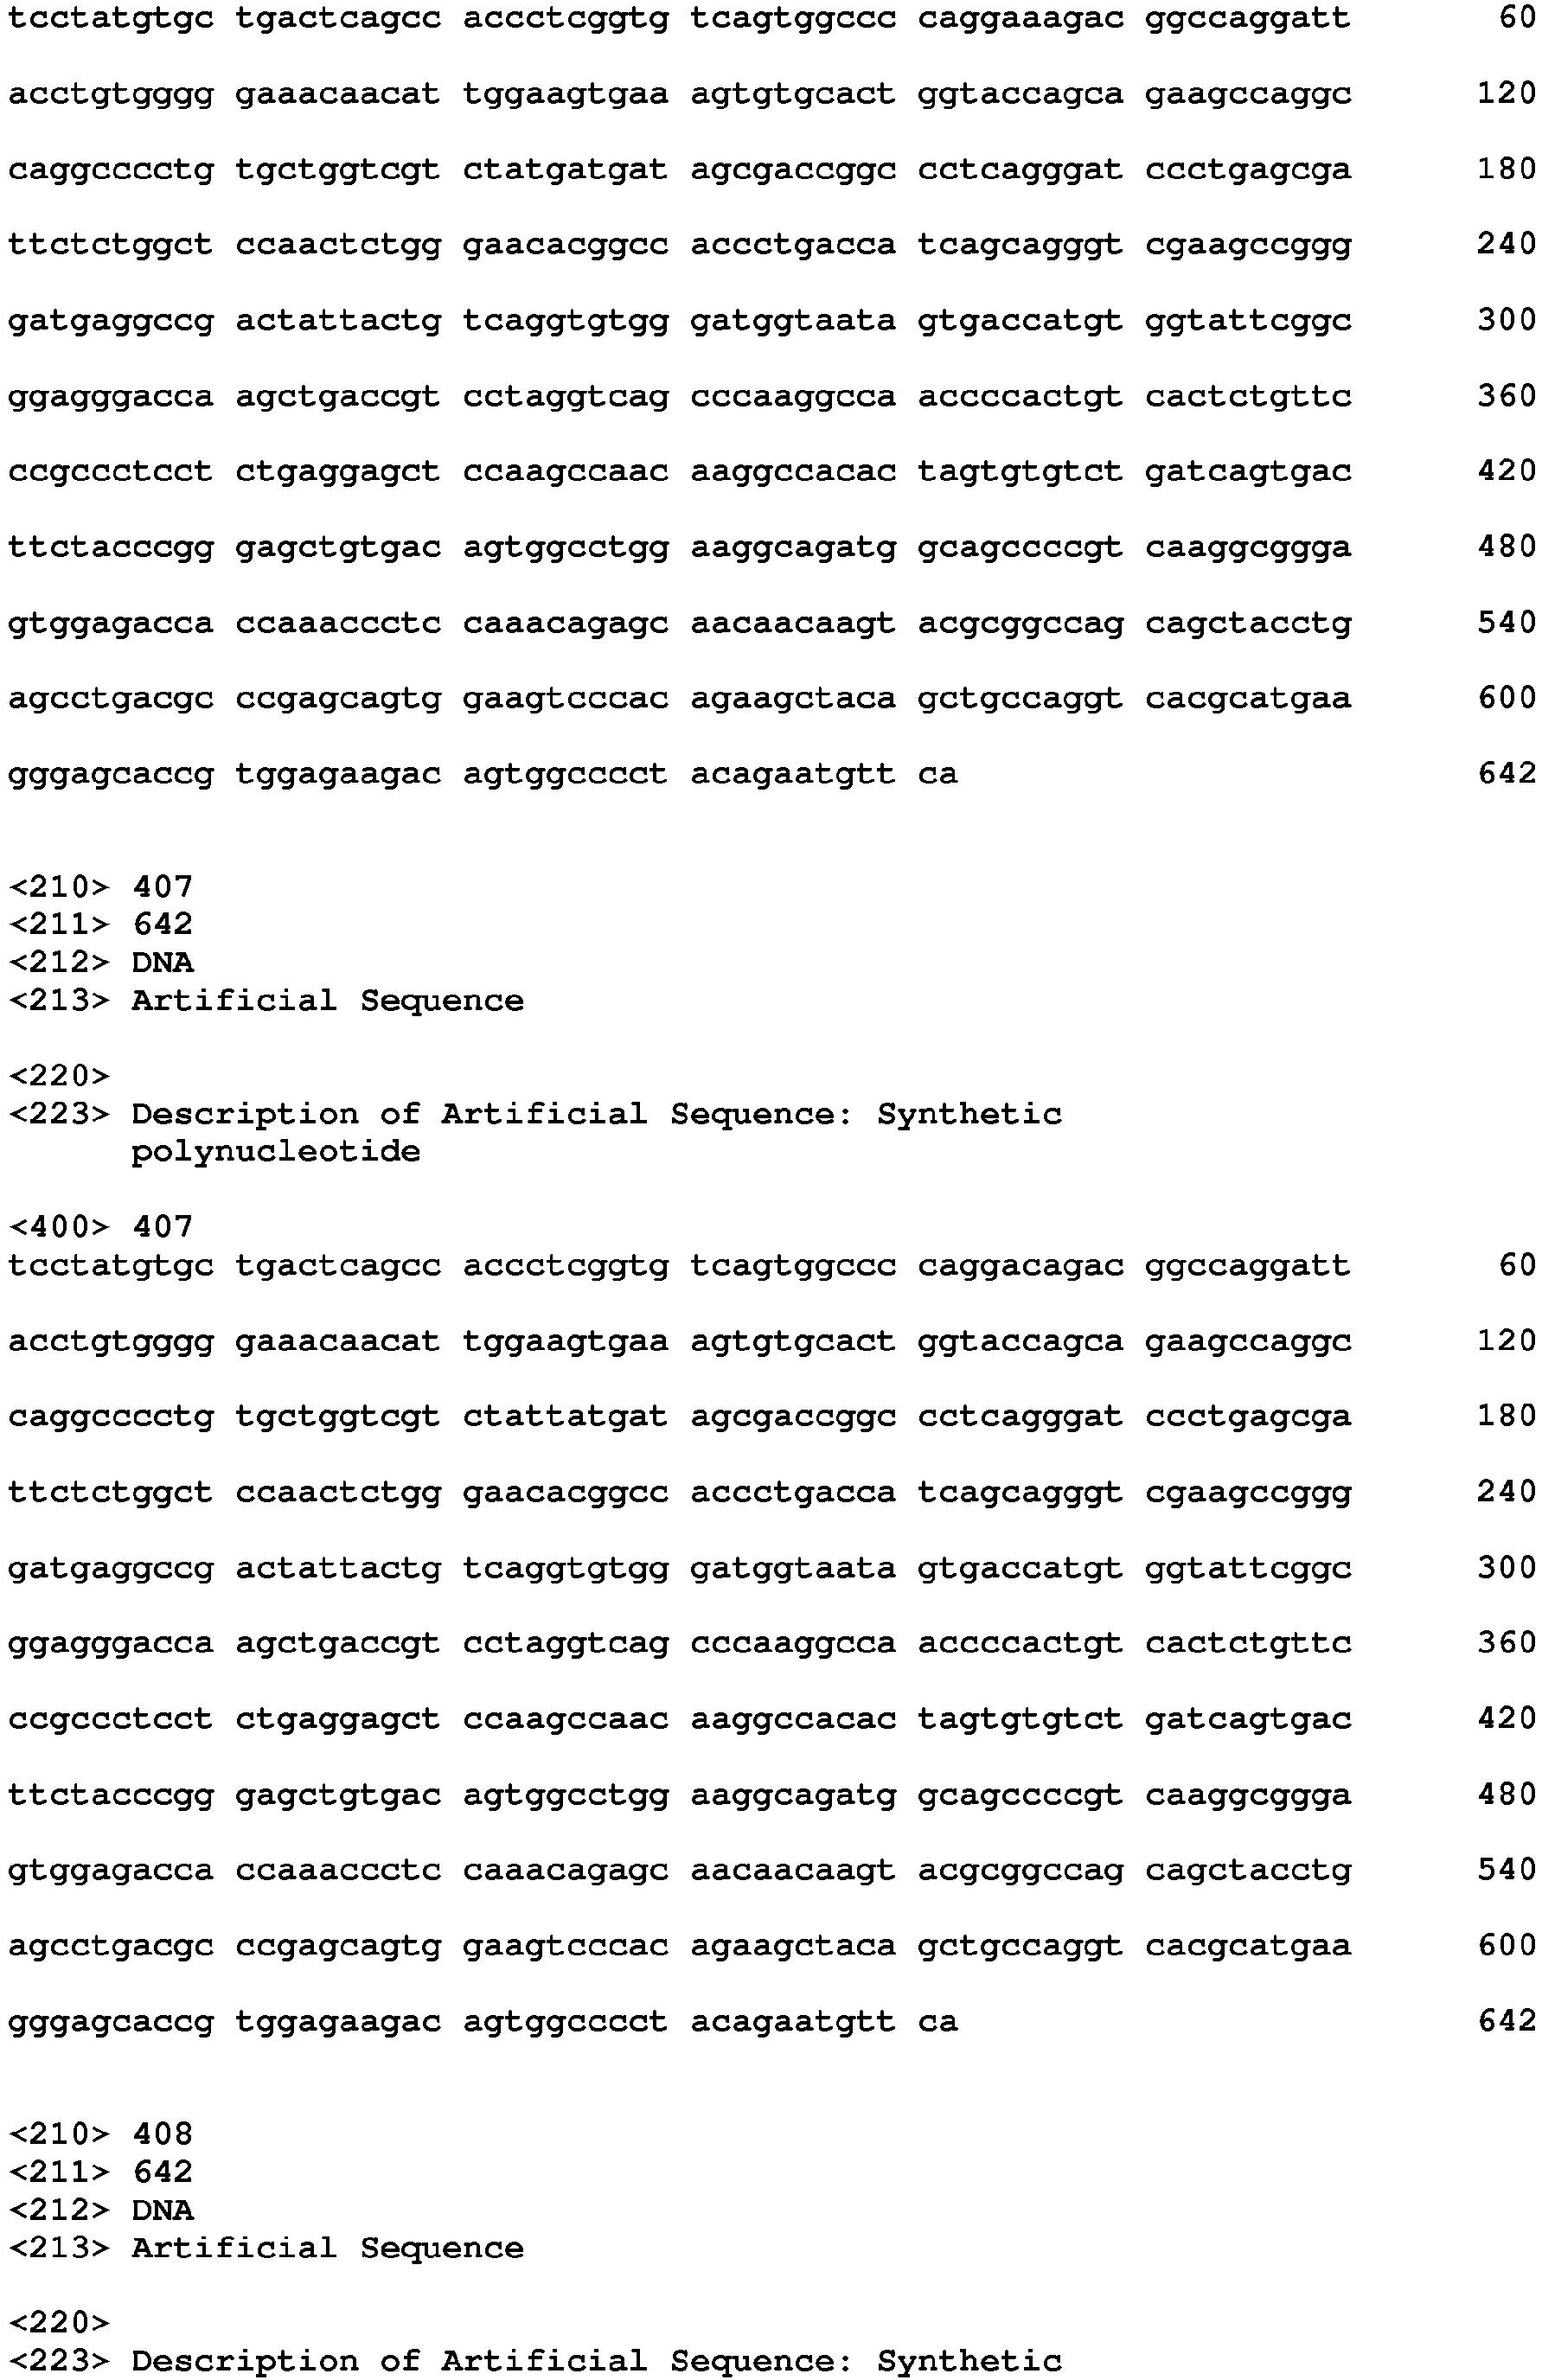 Figure imgb0696